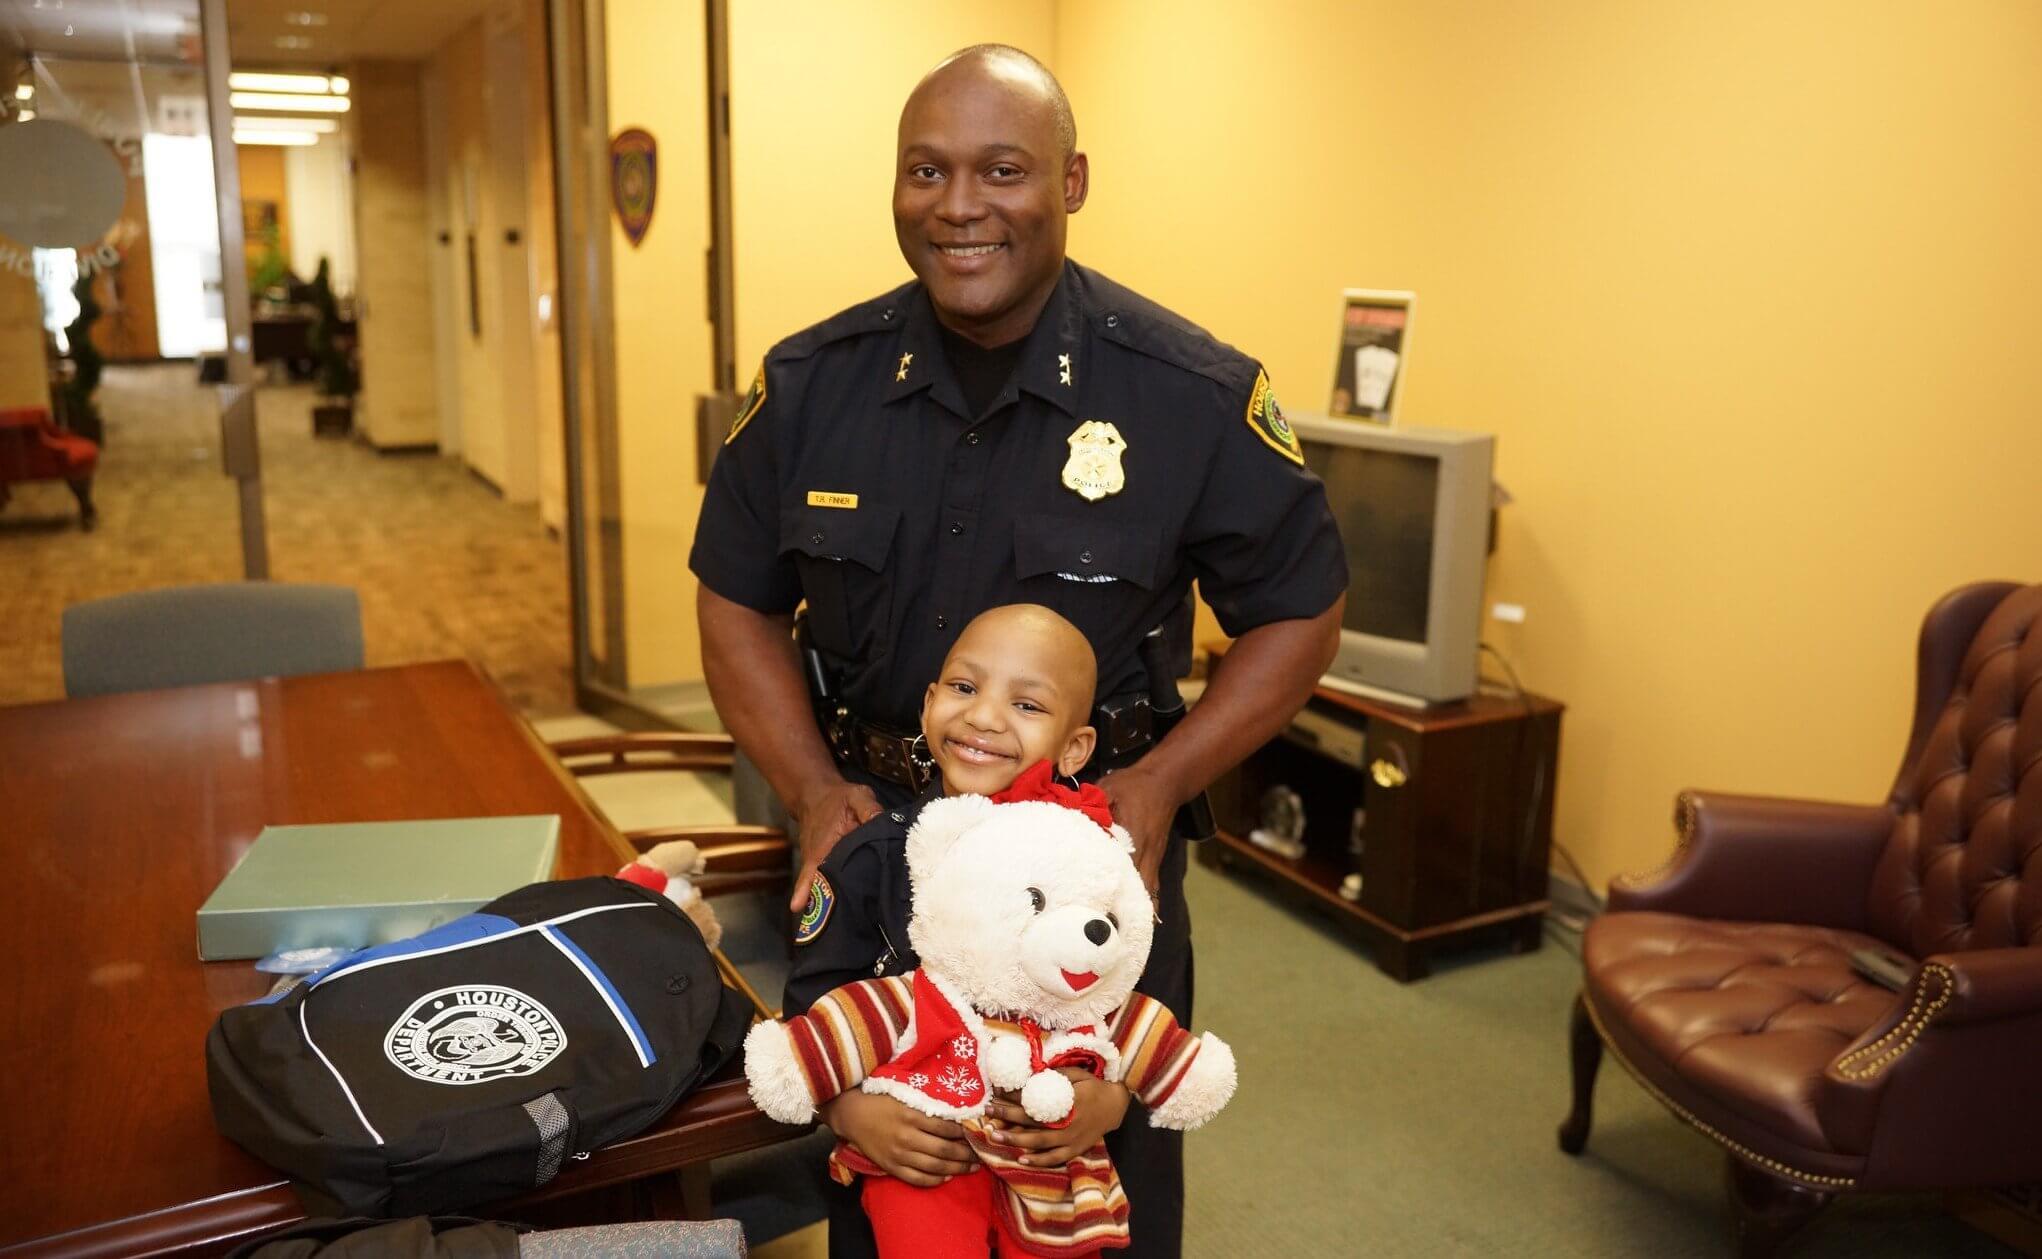 Credit: Houston Police Department